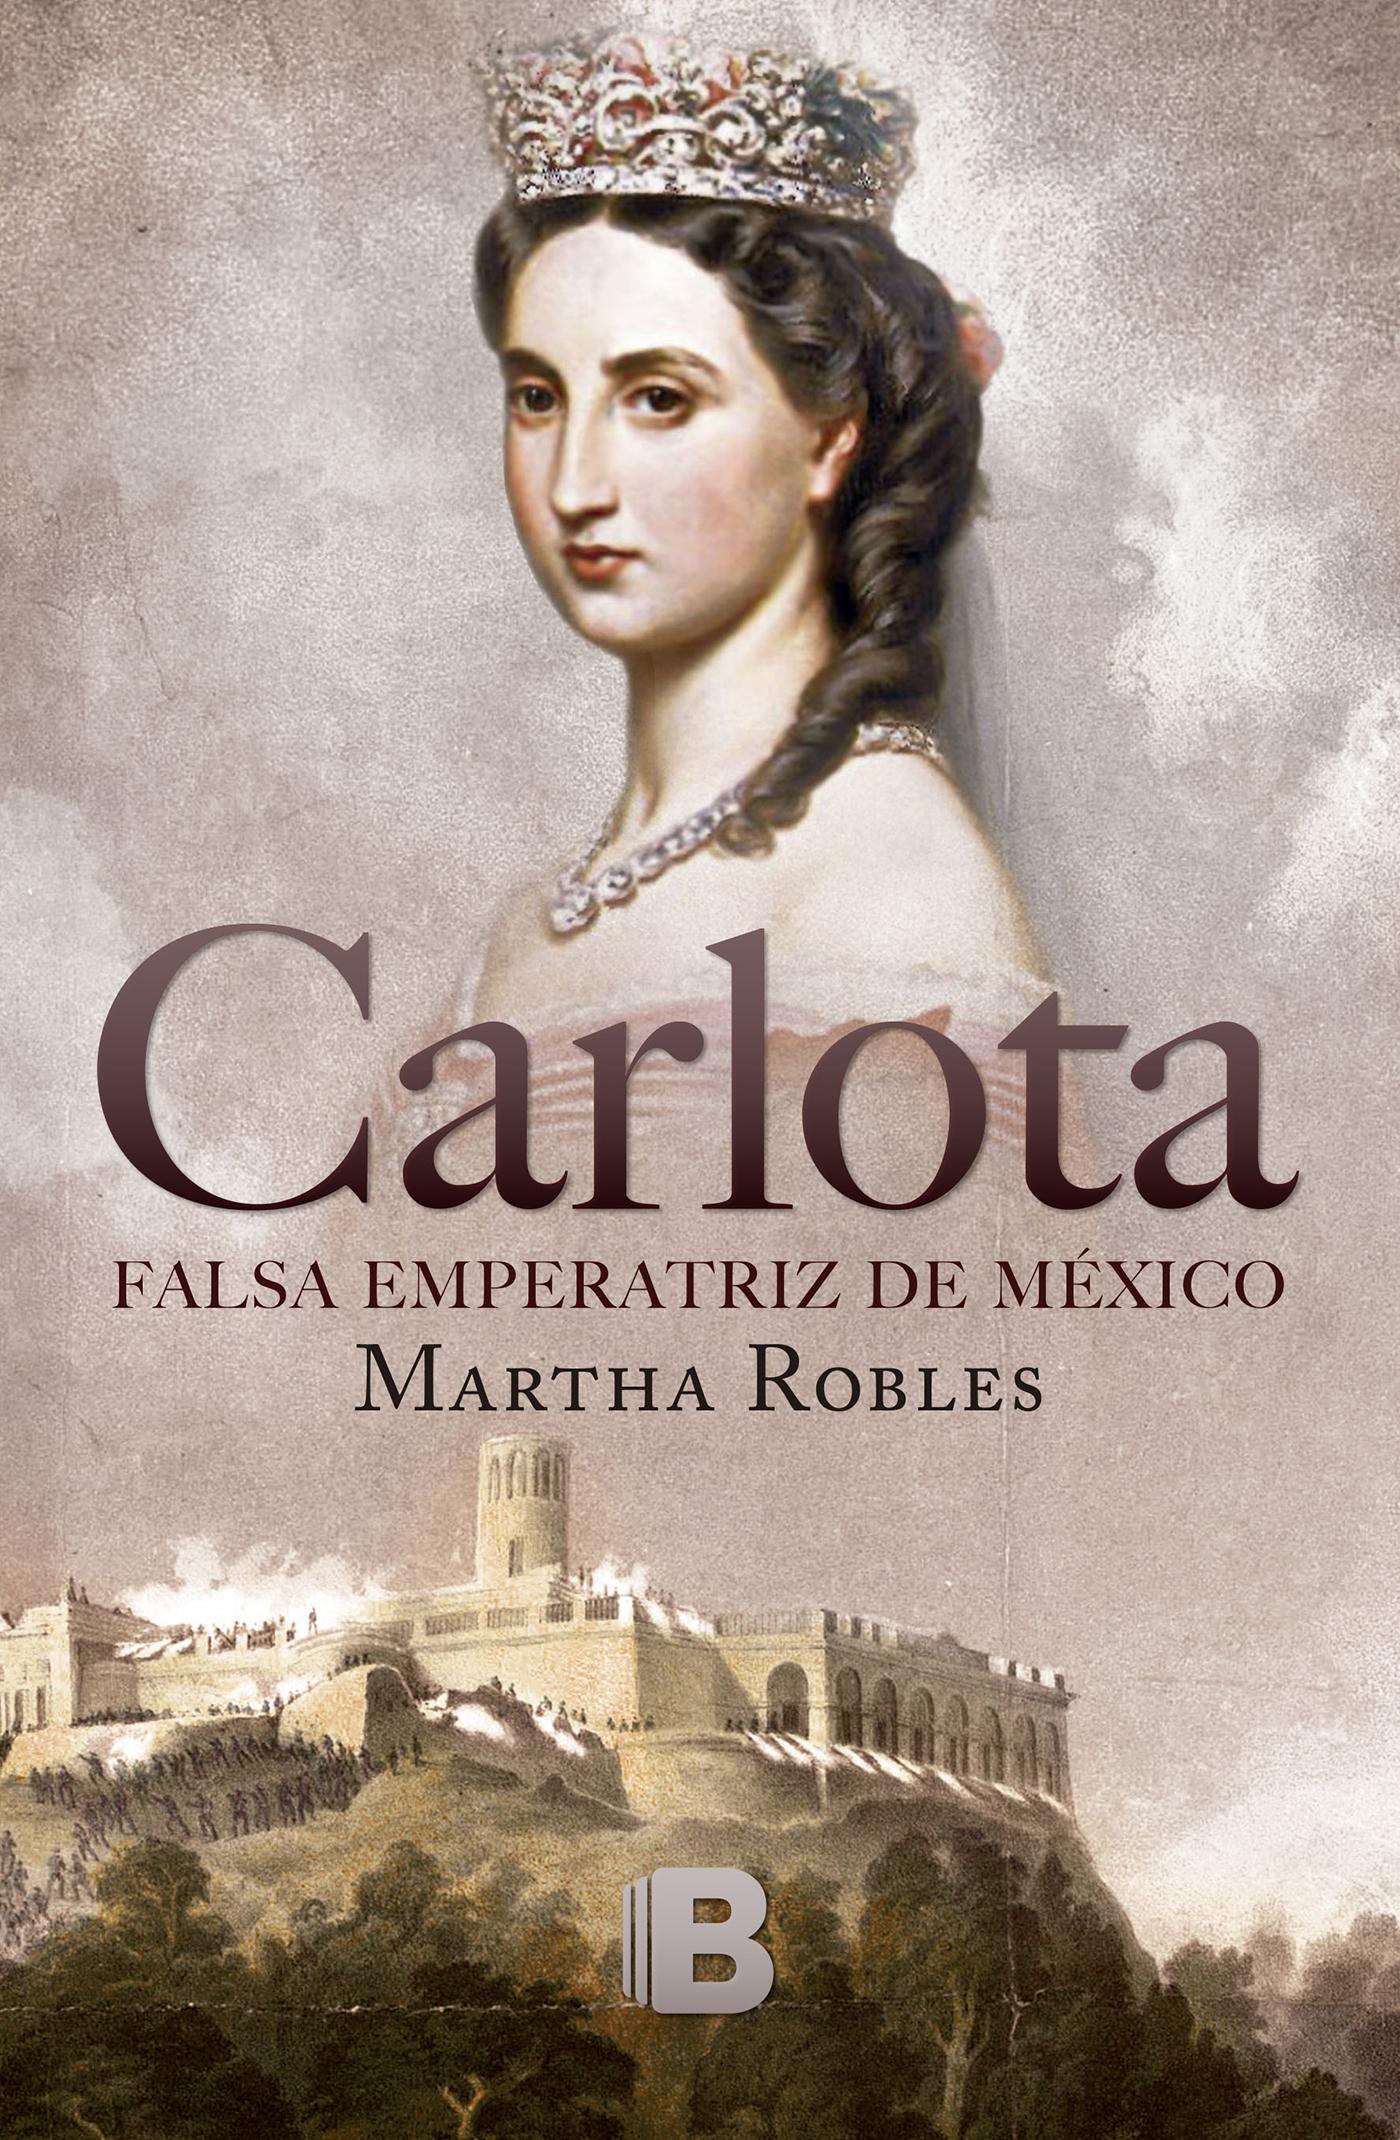 Carlota Falsa emperatriz de México